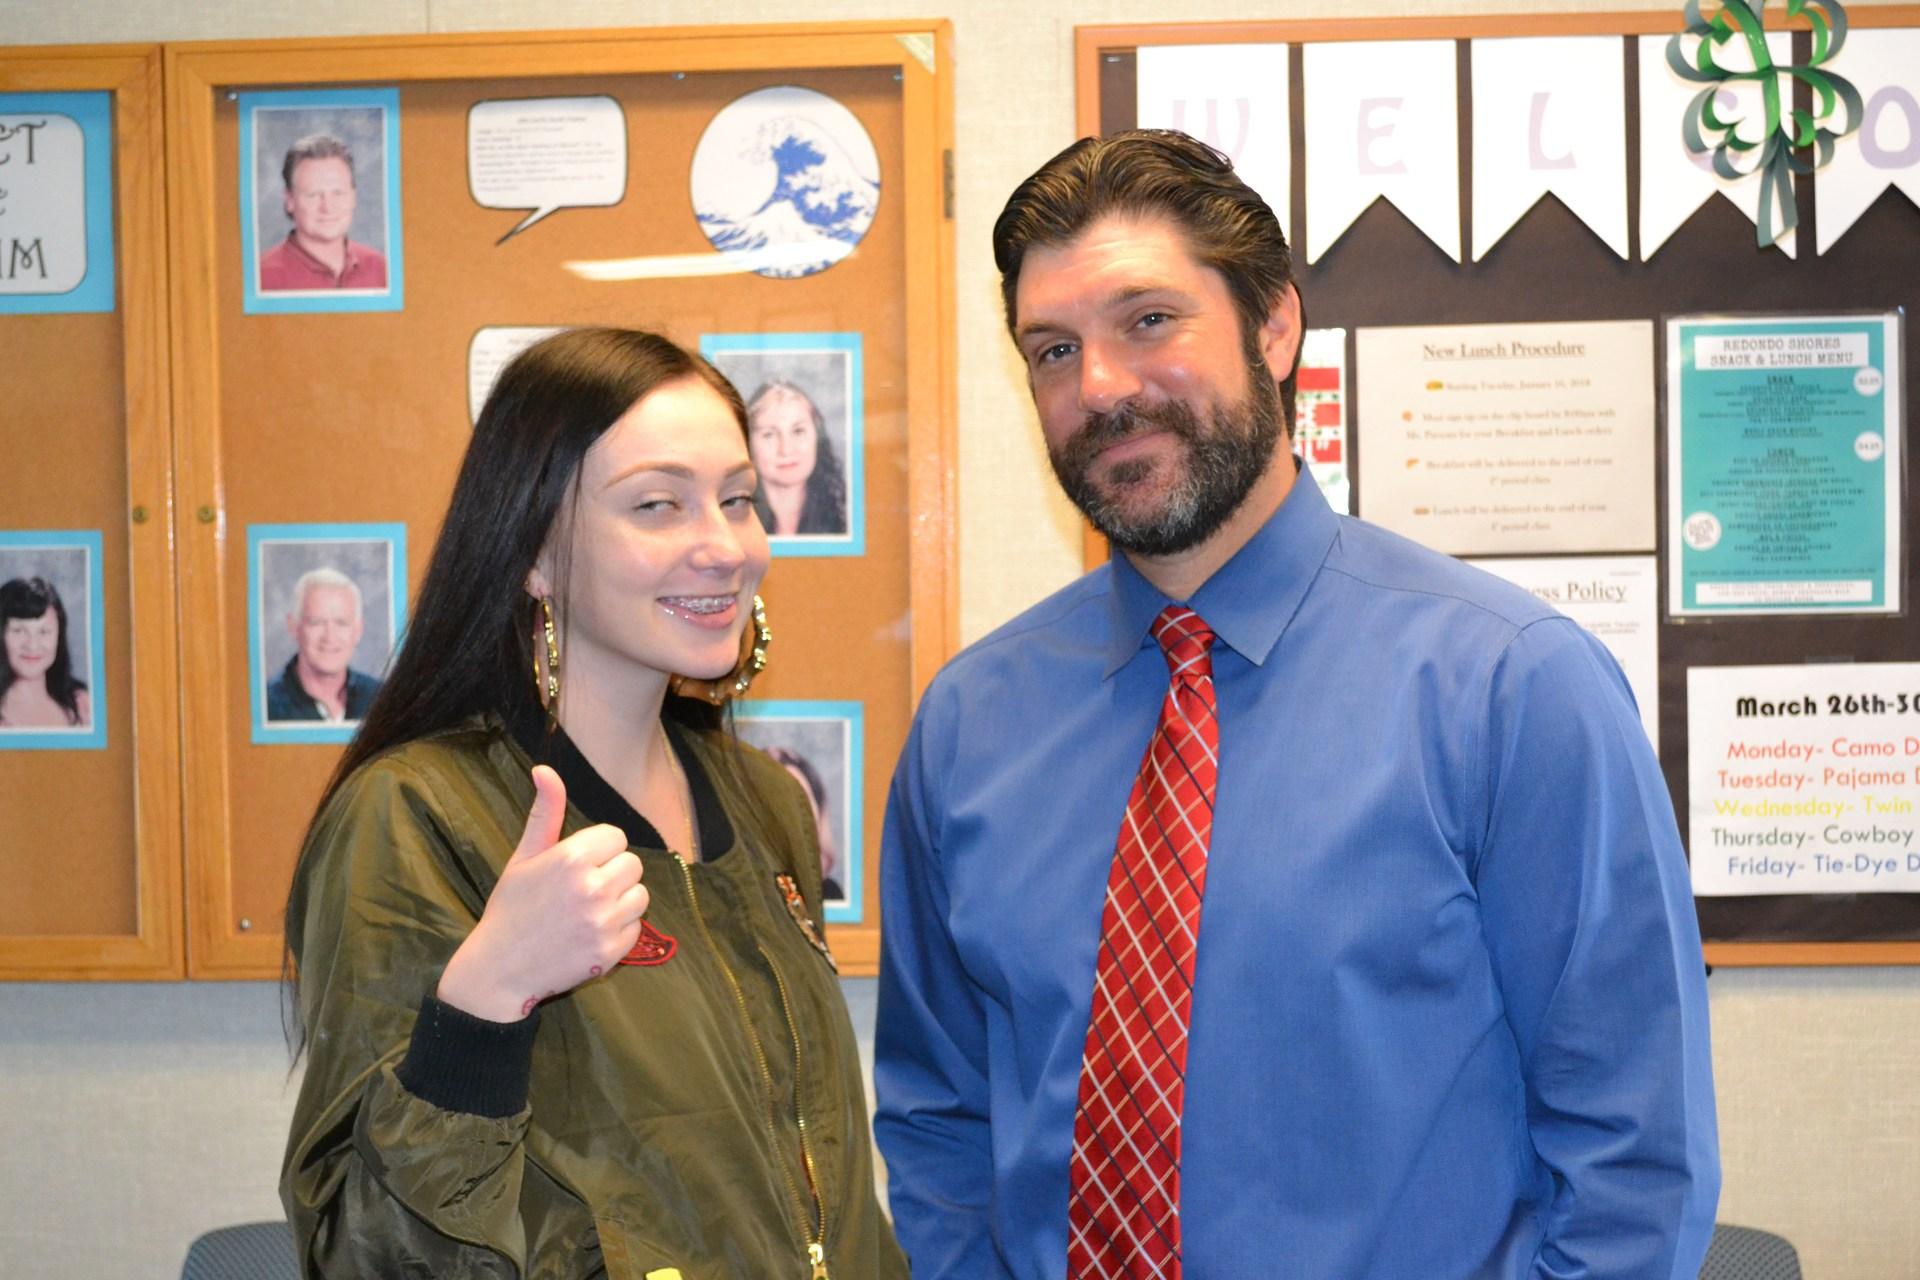 Principal, Counselor, Student